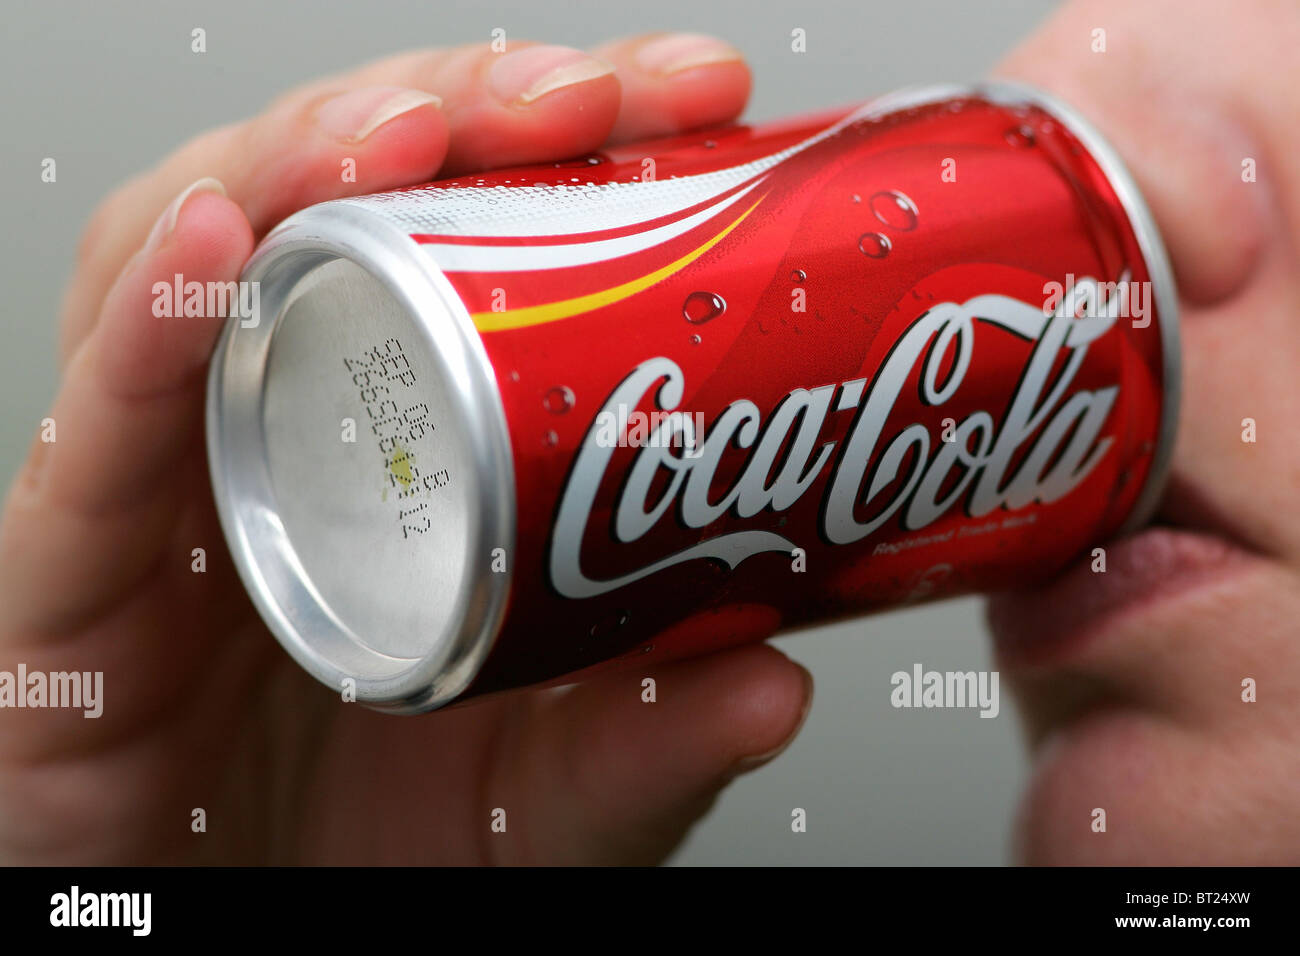 Mini Kühlschrank Cola Dose : Coca cola mini kühlschrank dose coca cola dose mini kühlschrank